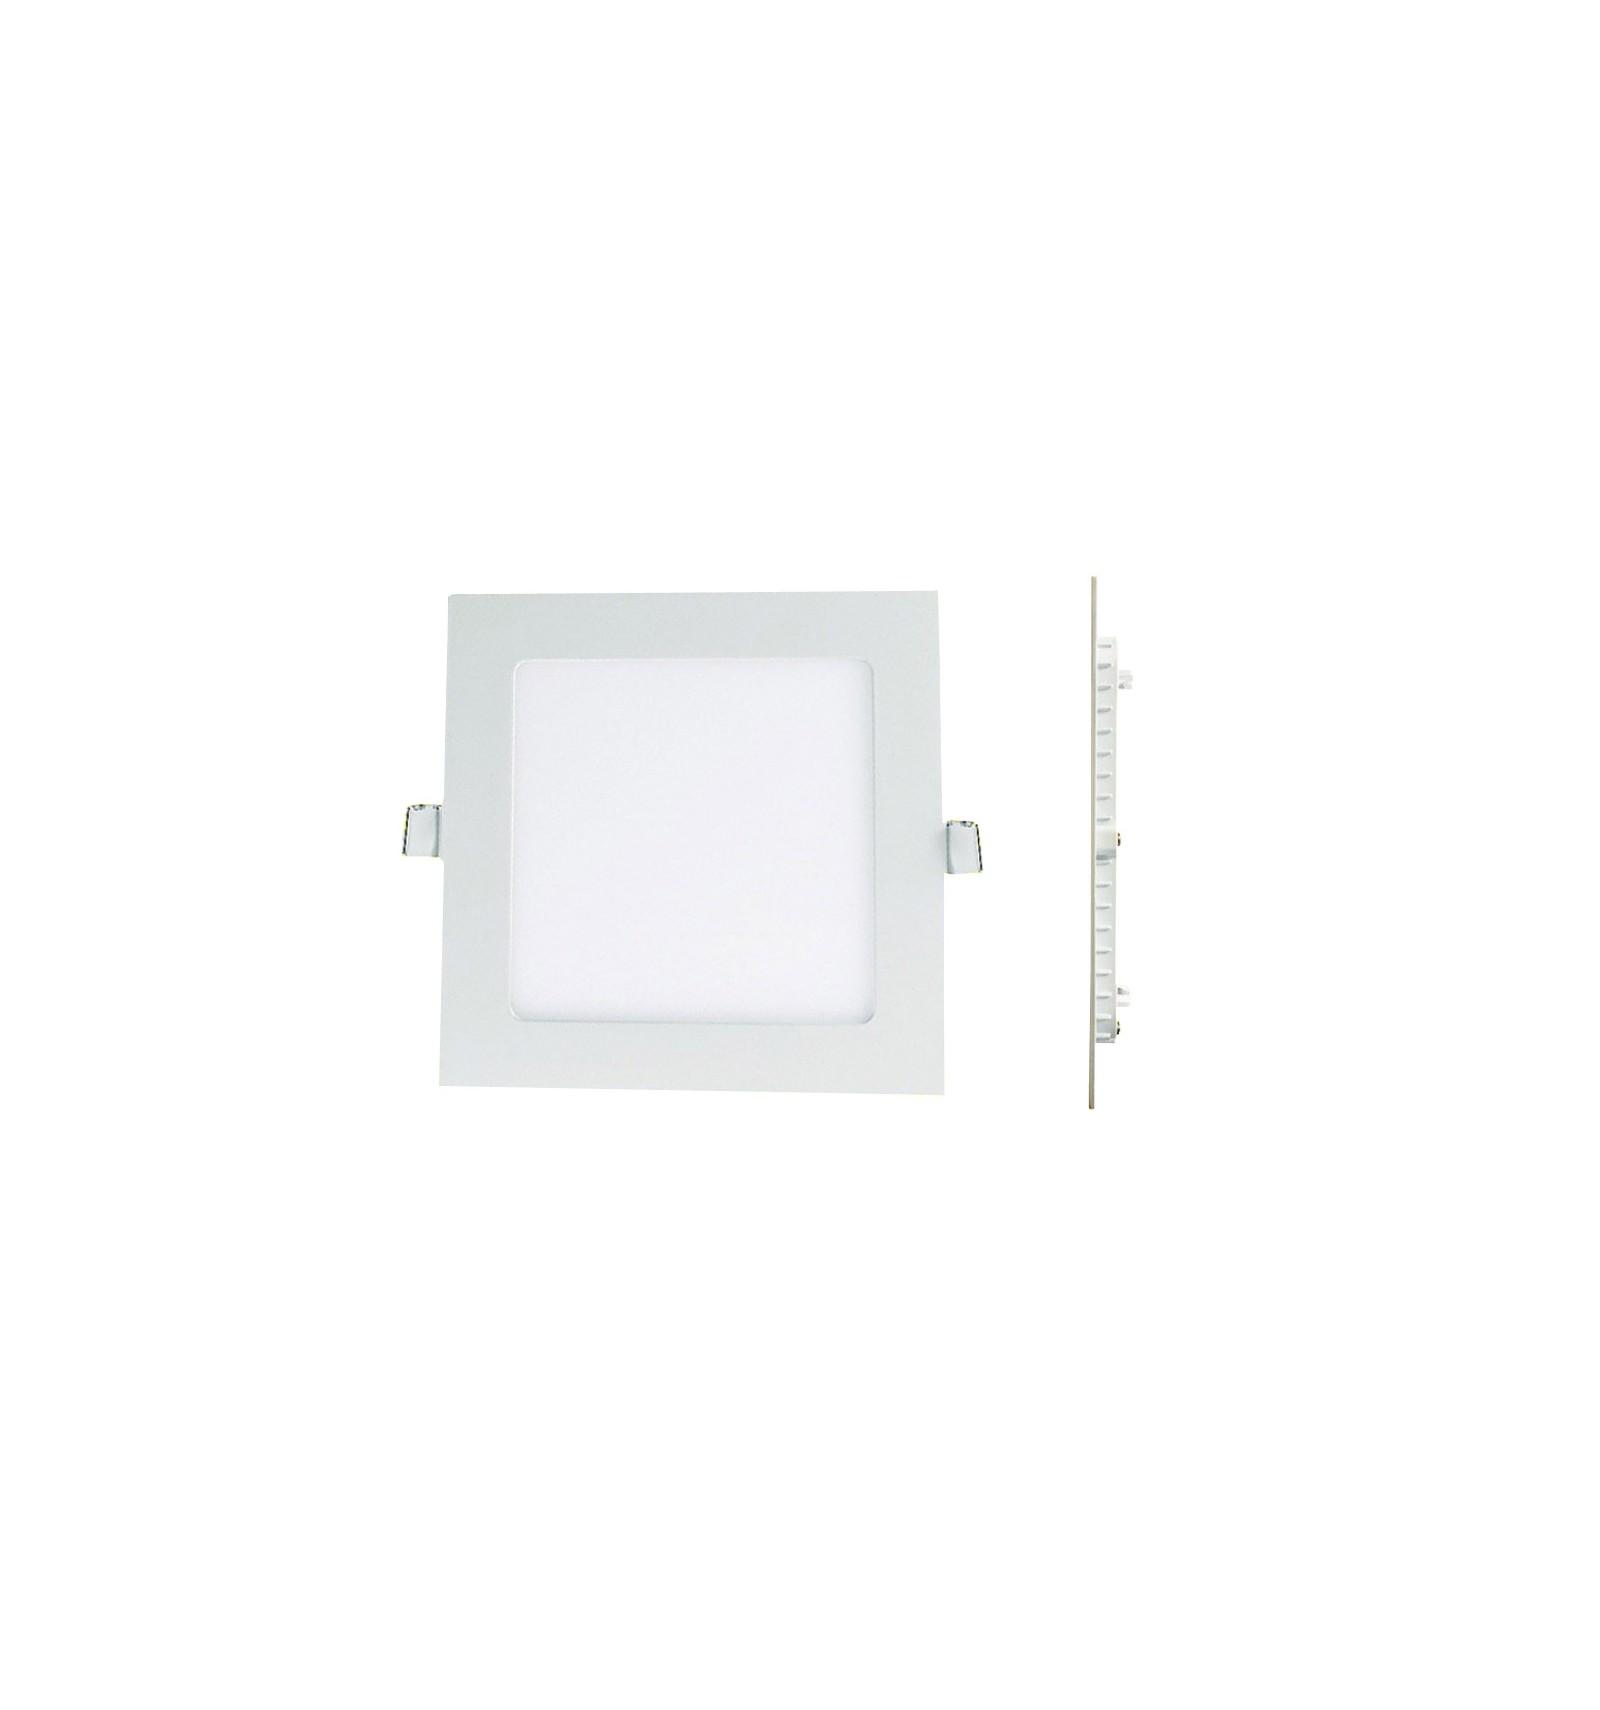 spot encastrable led carre downlight panel extra plat 12w. Black Bedroom Furniture Sets. Home Design Ideas